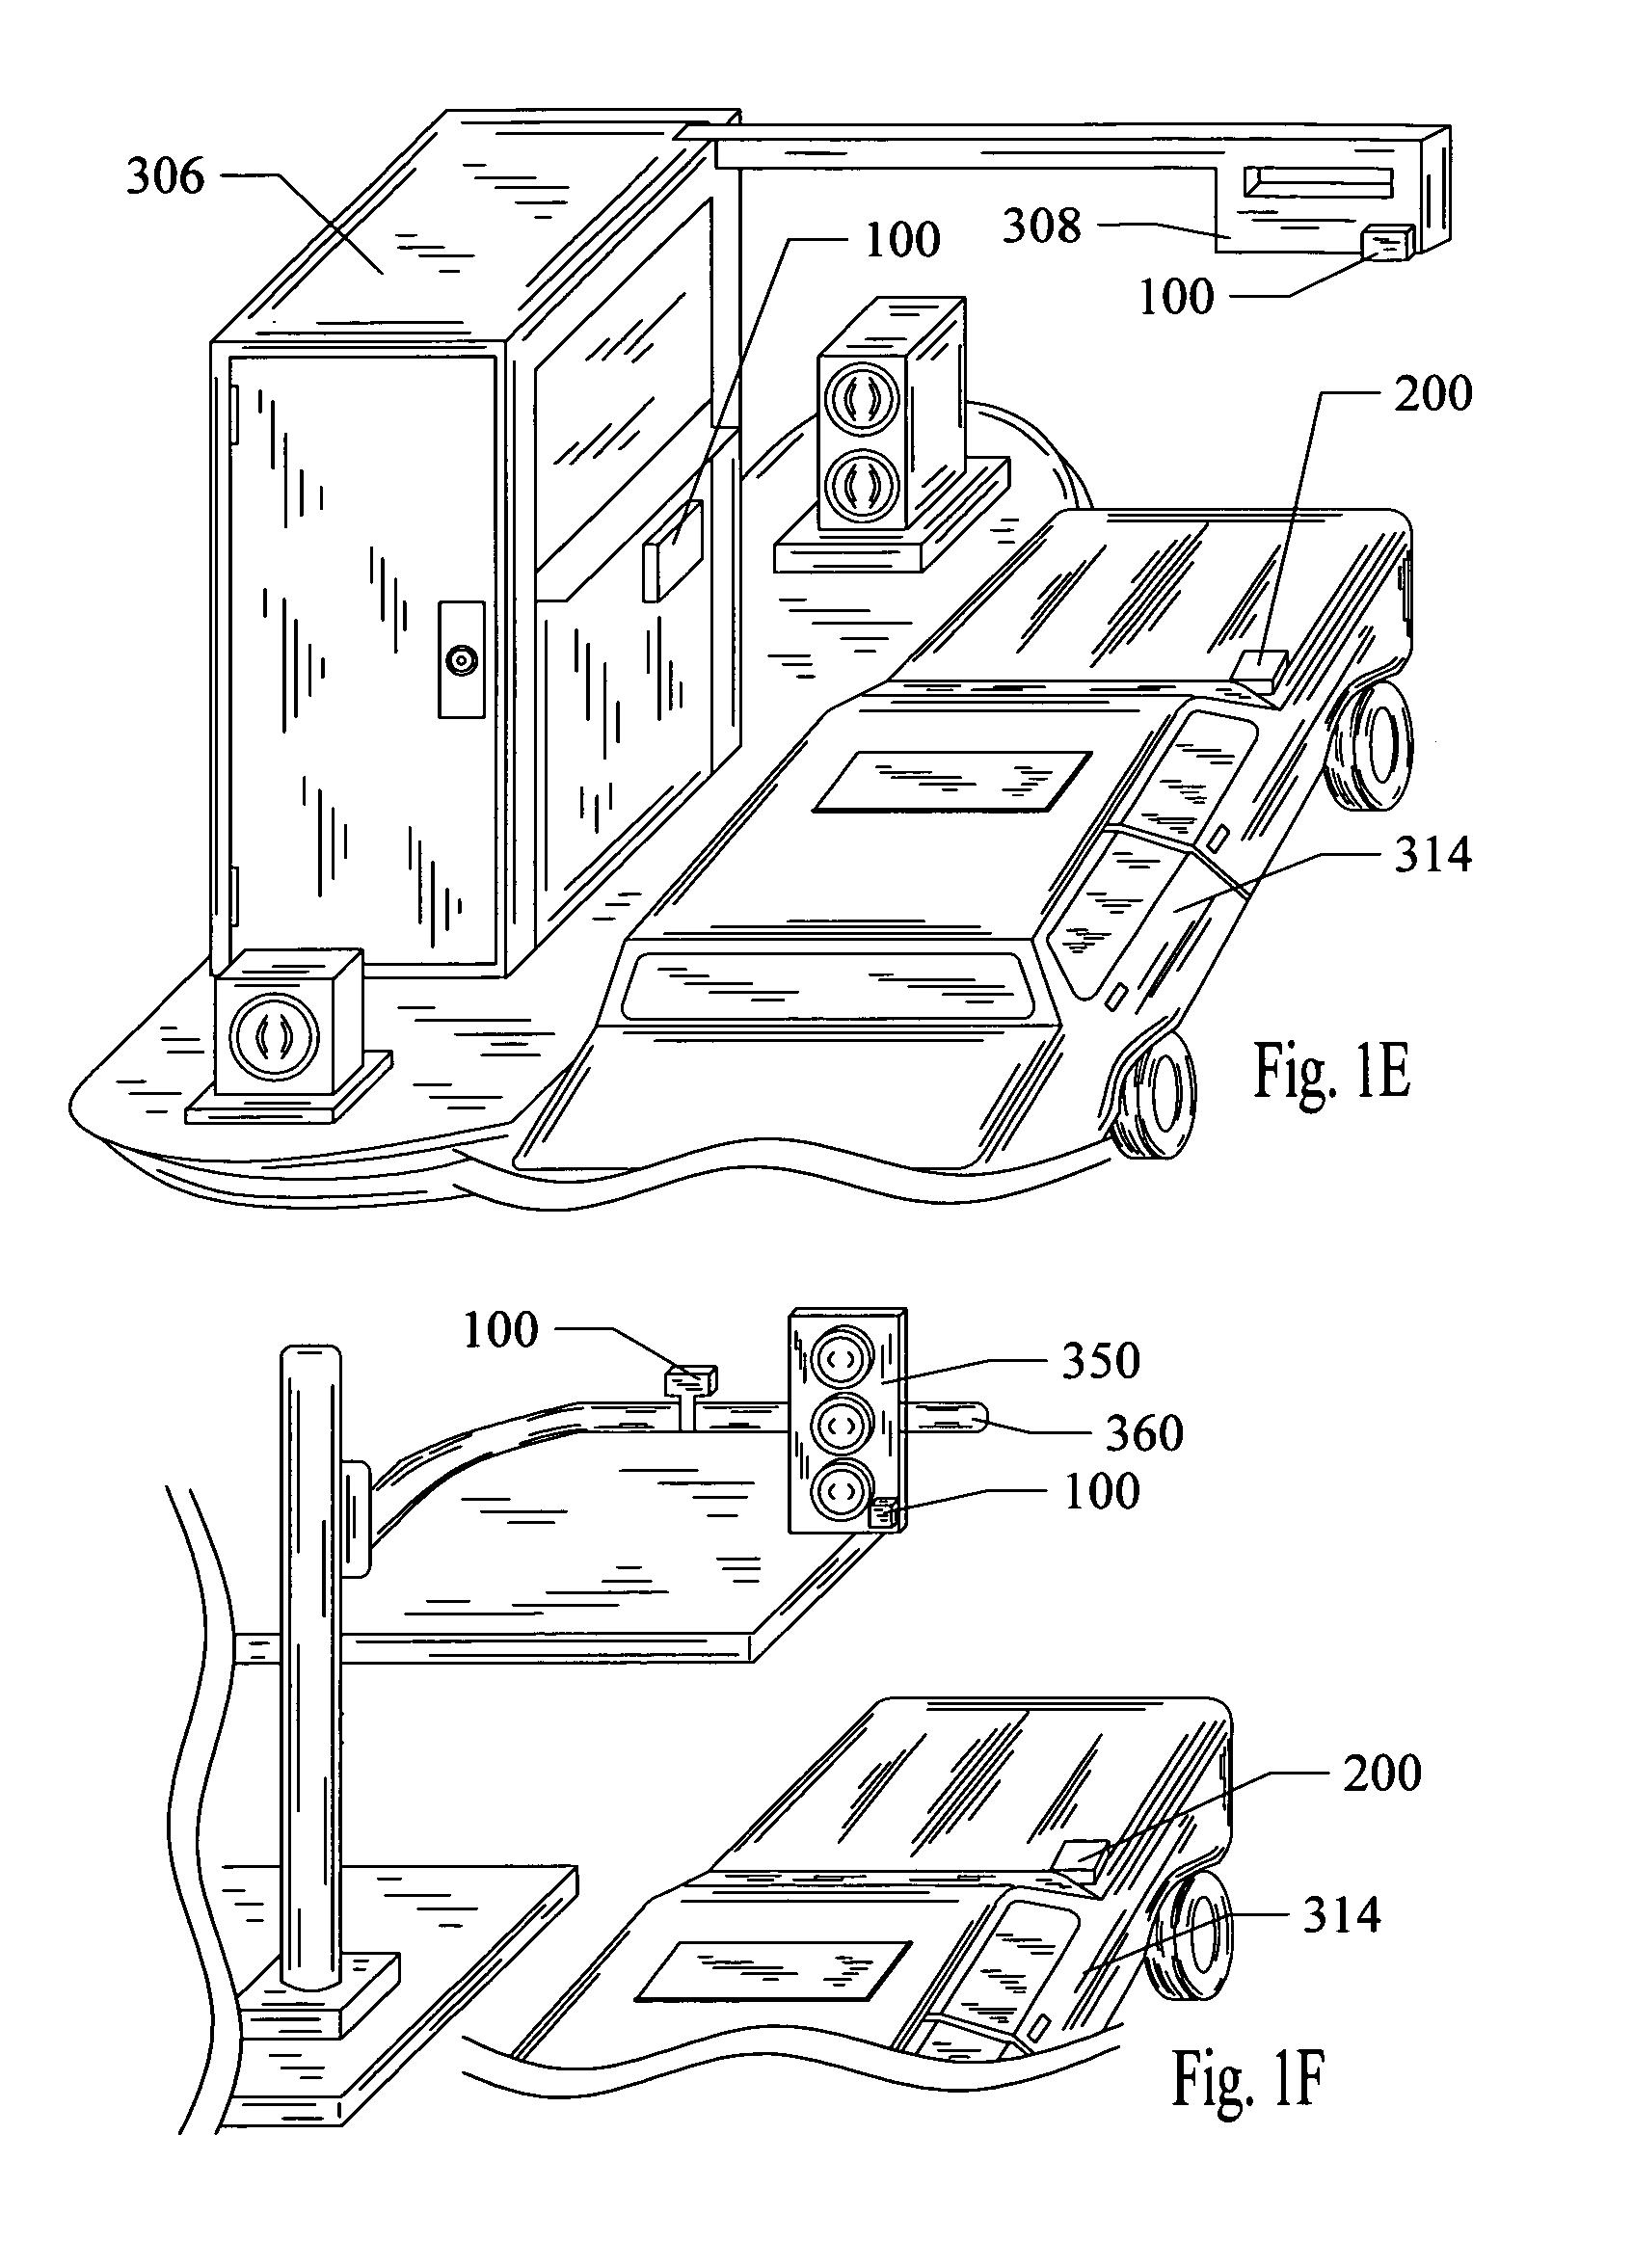 Patent US 7,502,672 B1